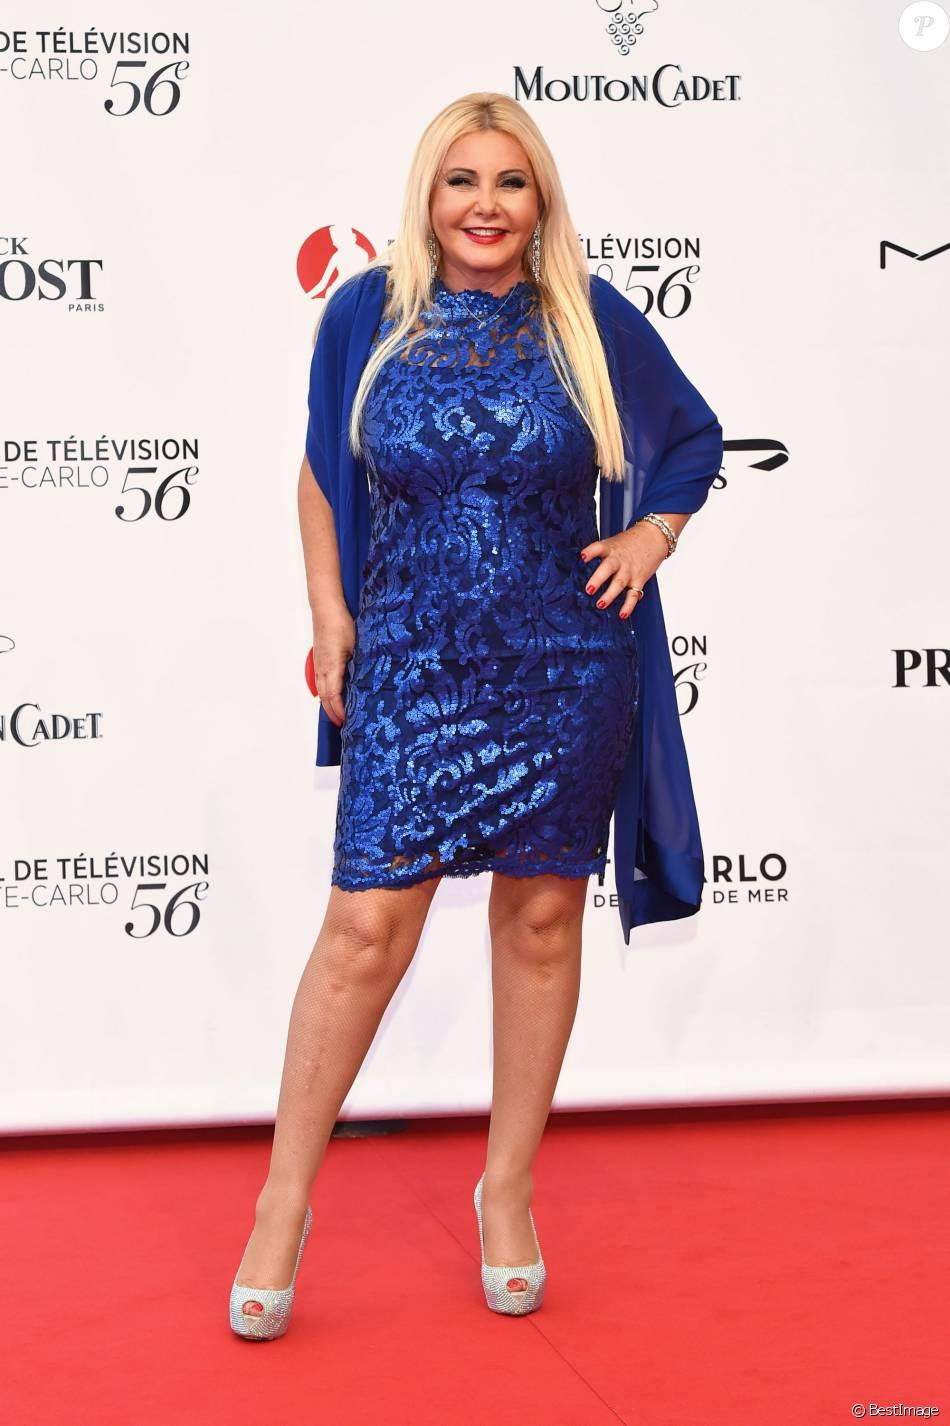 Lady Monika Bacardi at TV Festival Monte Carlo